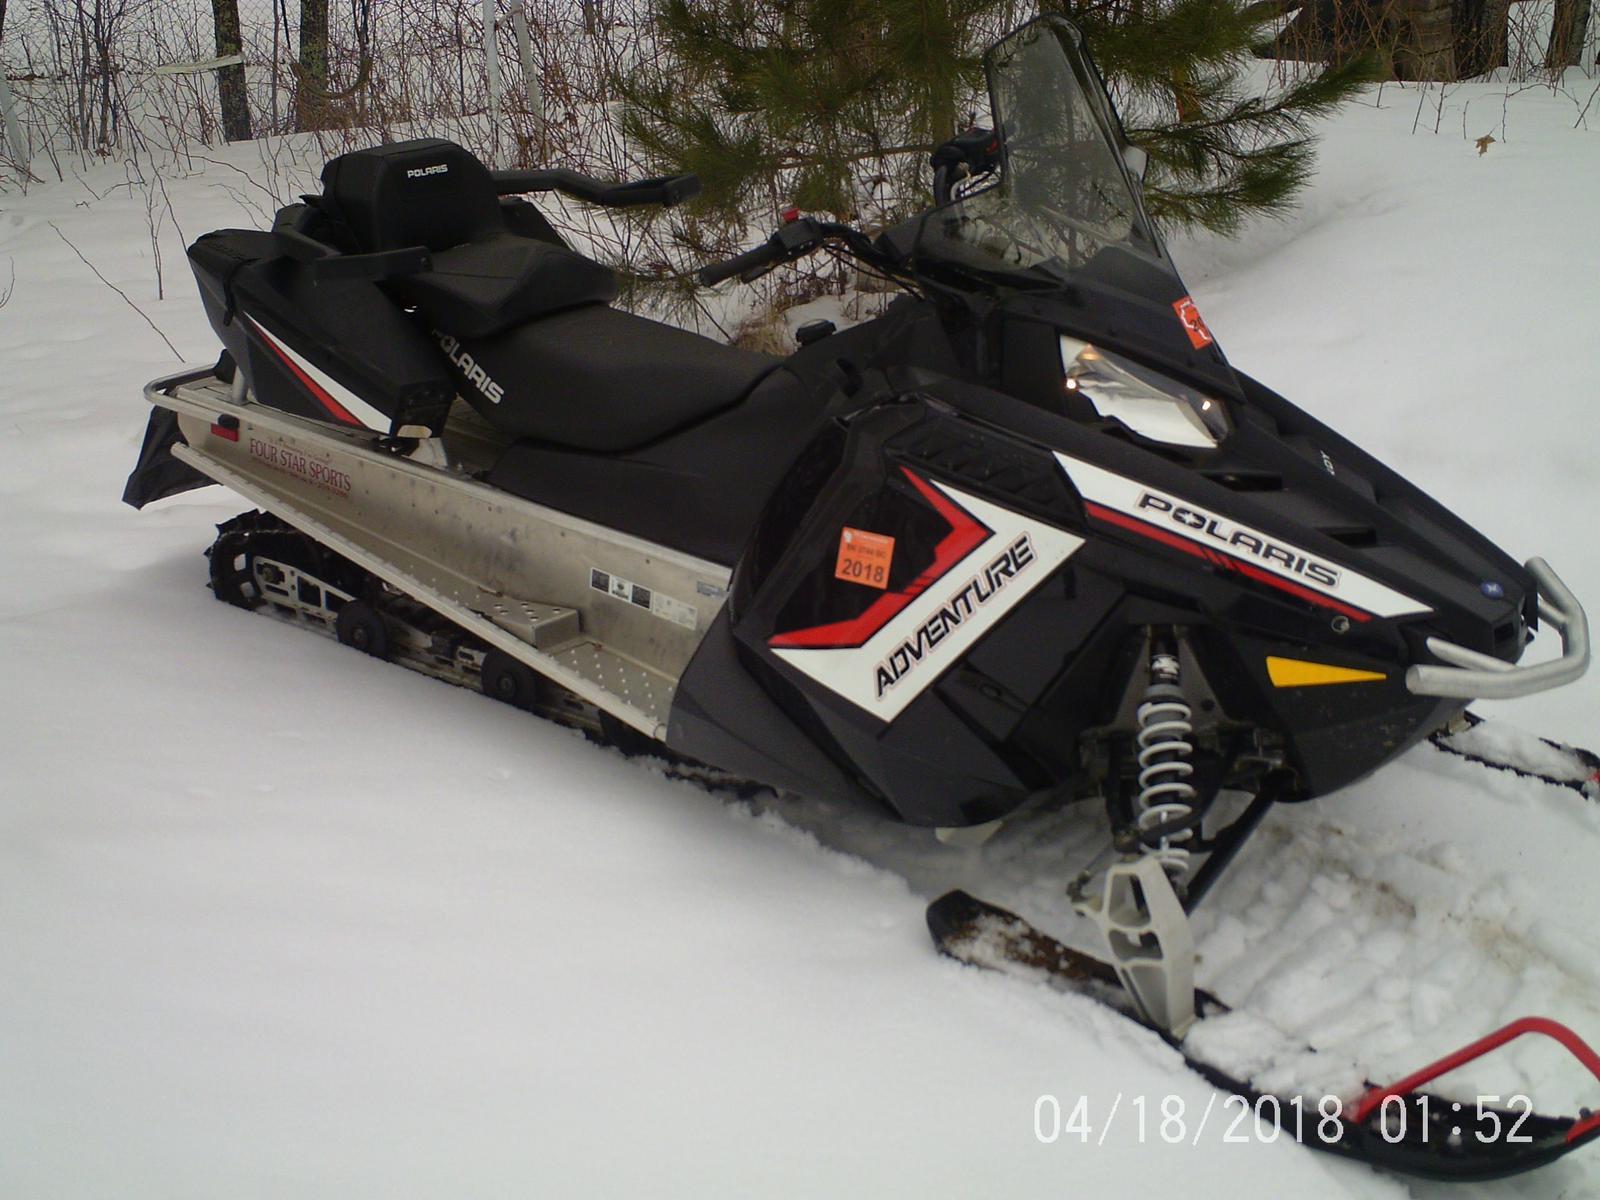 Used Snowmobiles from Polaris FOUR STAR SPORTS WEBB LAKE, WI